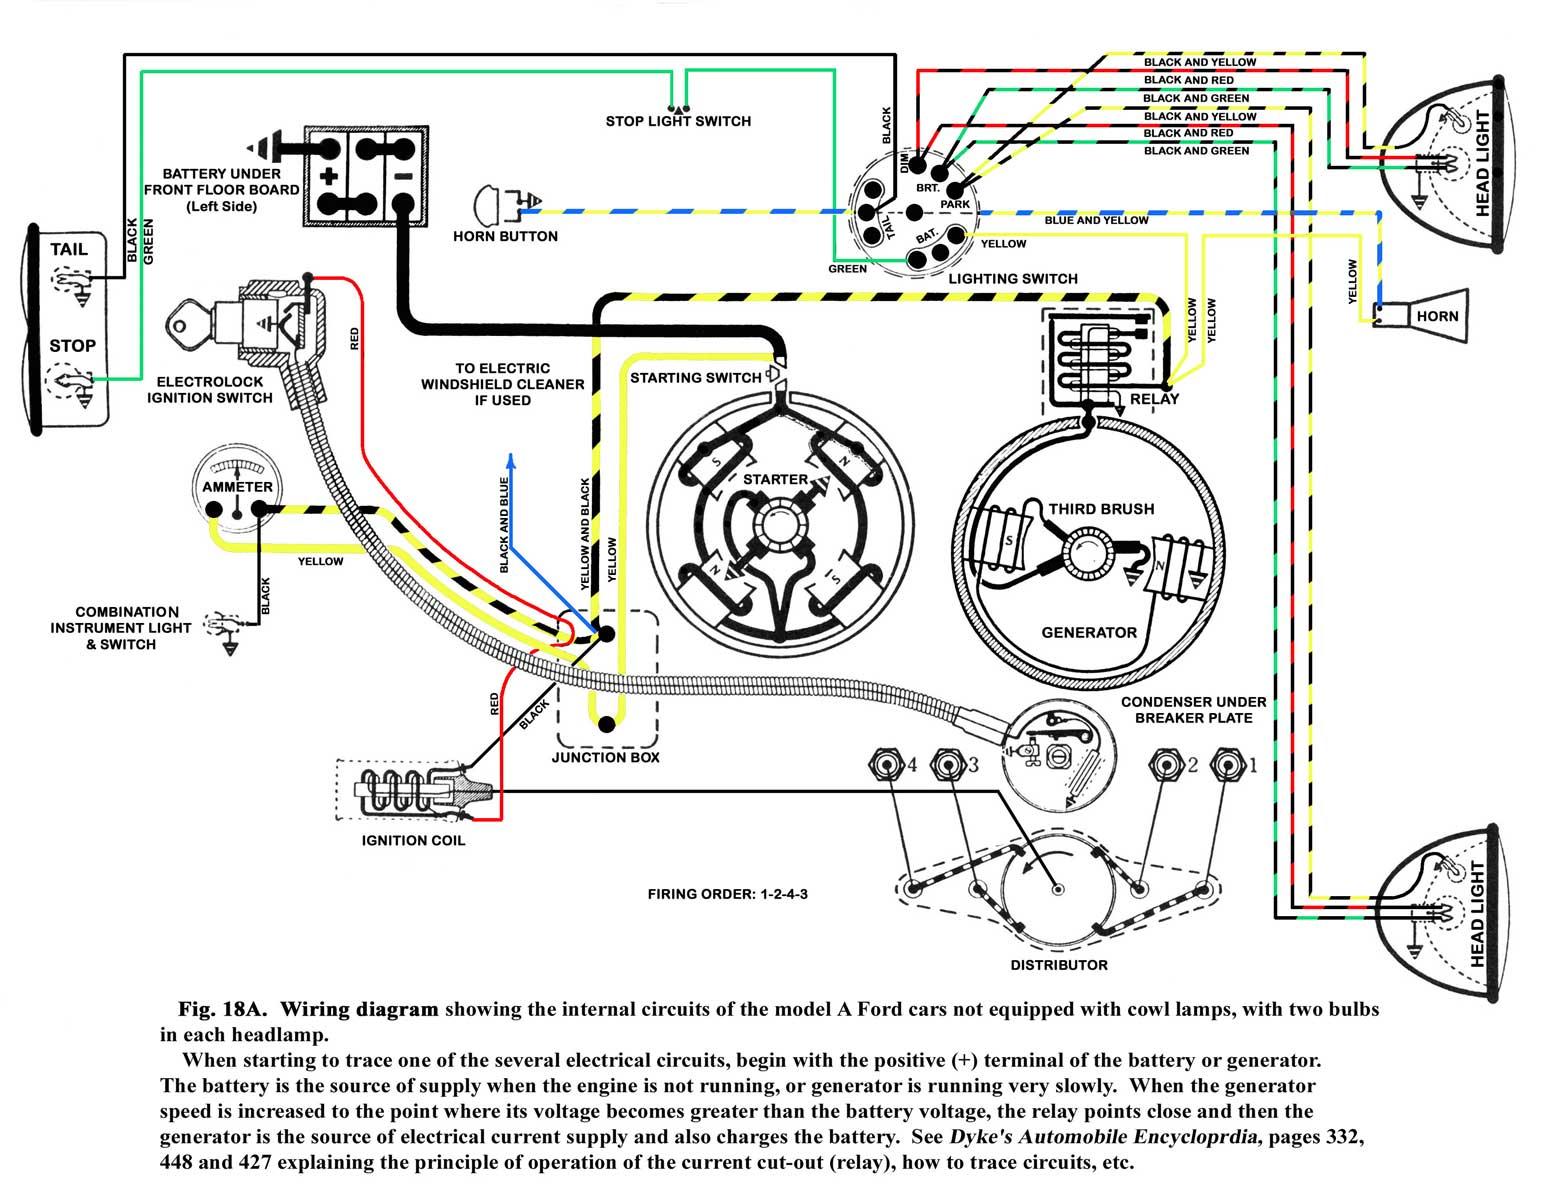 medium resolution of ford flathead 12 volt wiring schematic wiring diagramford f1 12 volt generator wiring diagram wiring diagram